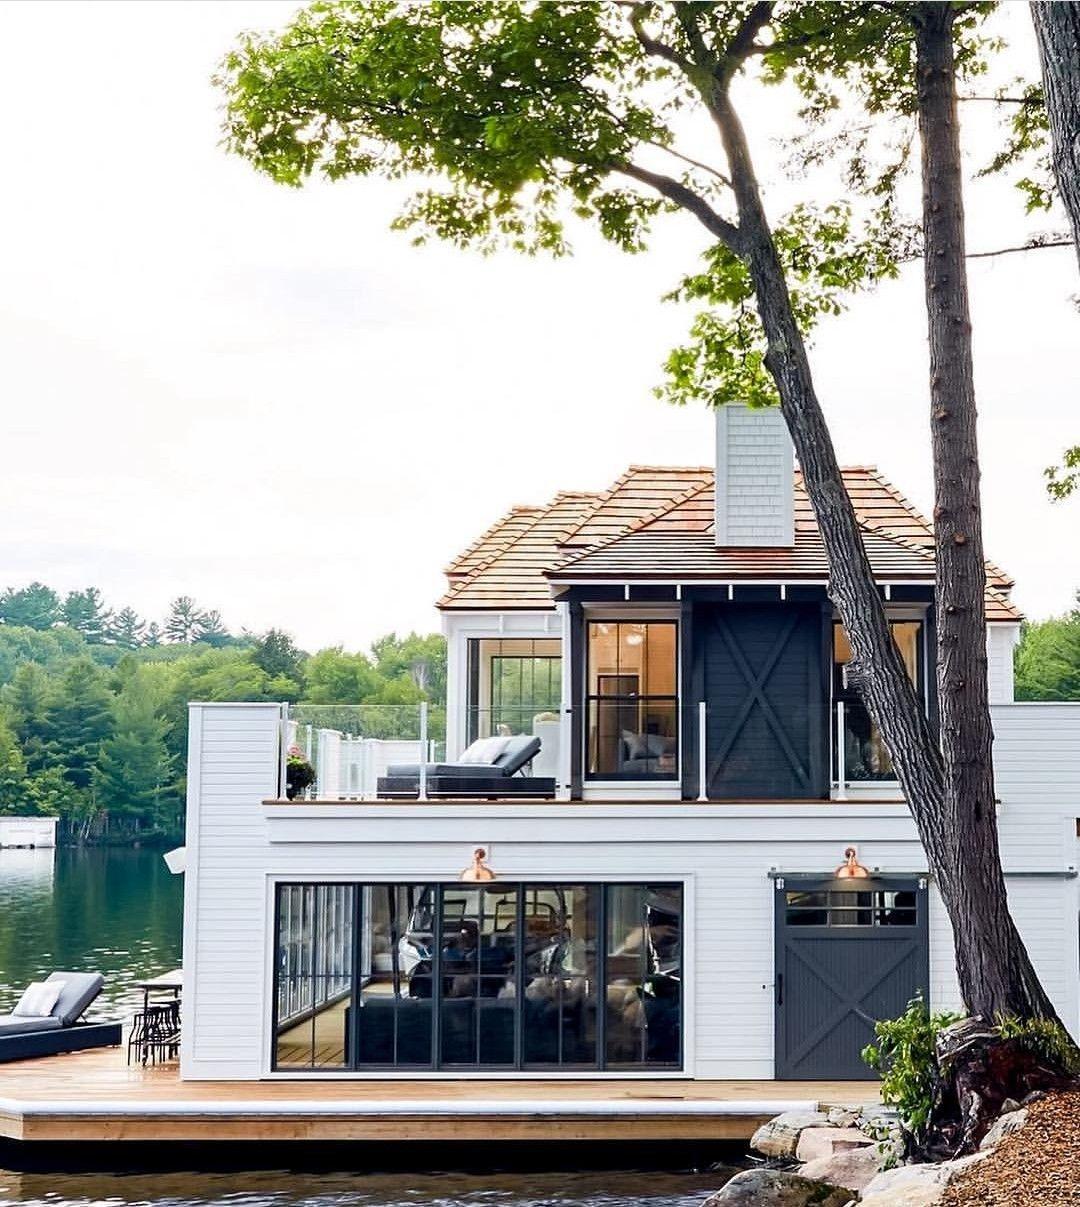 pin + insta // @ f o r t a n d f i e l d ♥ lake house with large windows  and second floor porch | Летние домики, Архитектура, Архитектурный дизайн